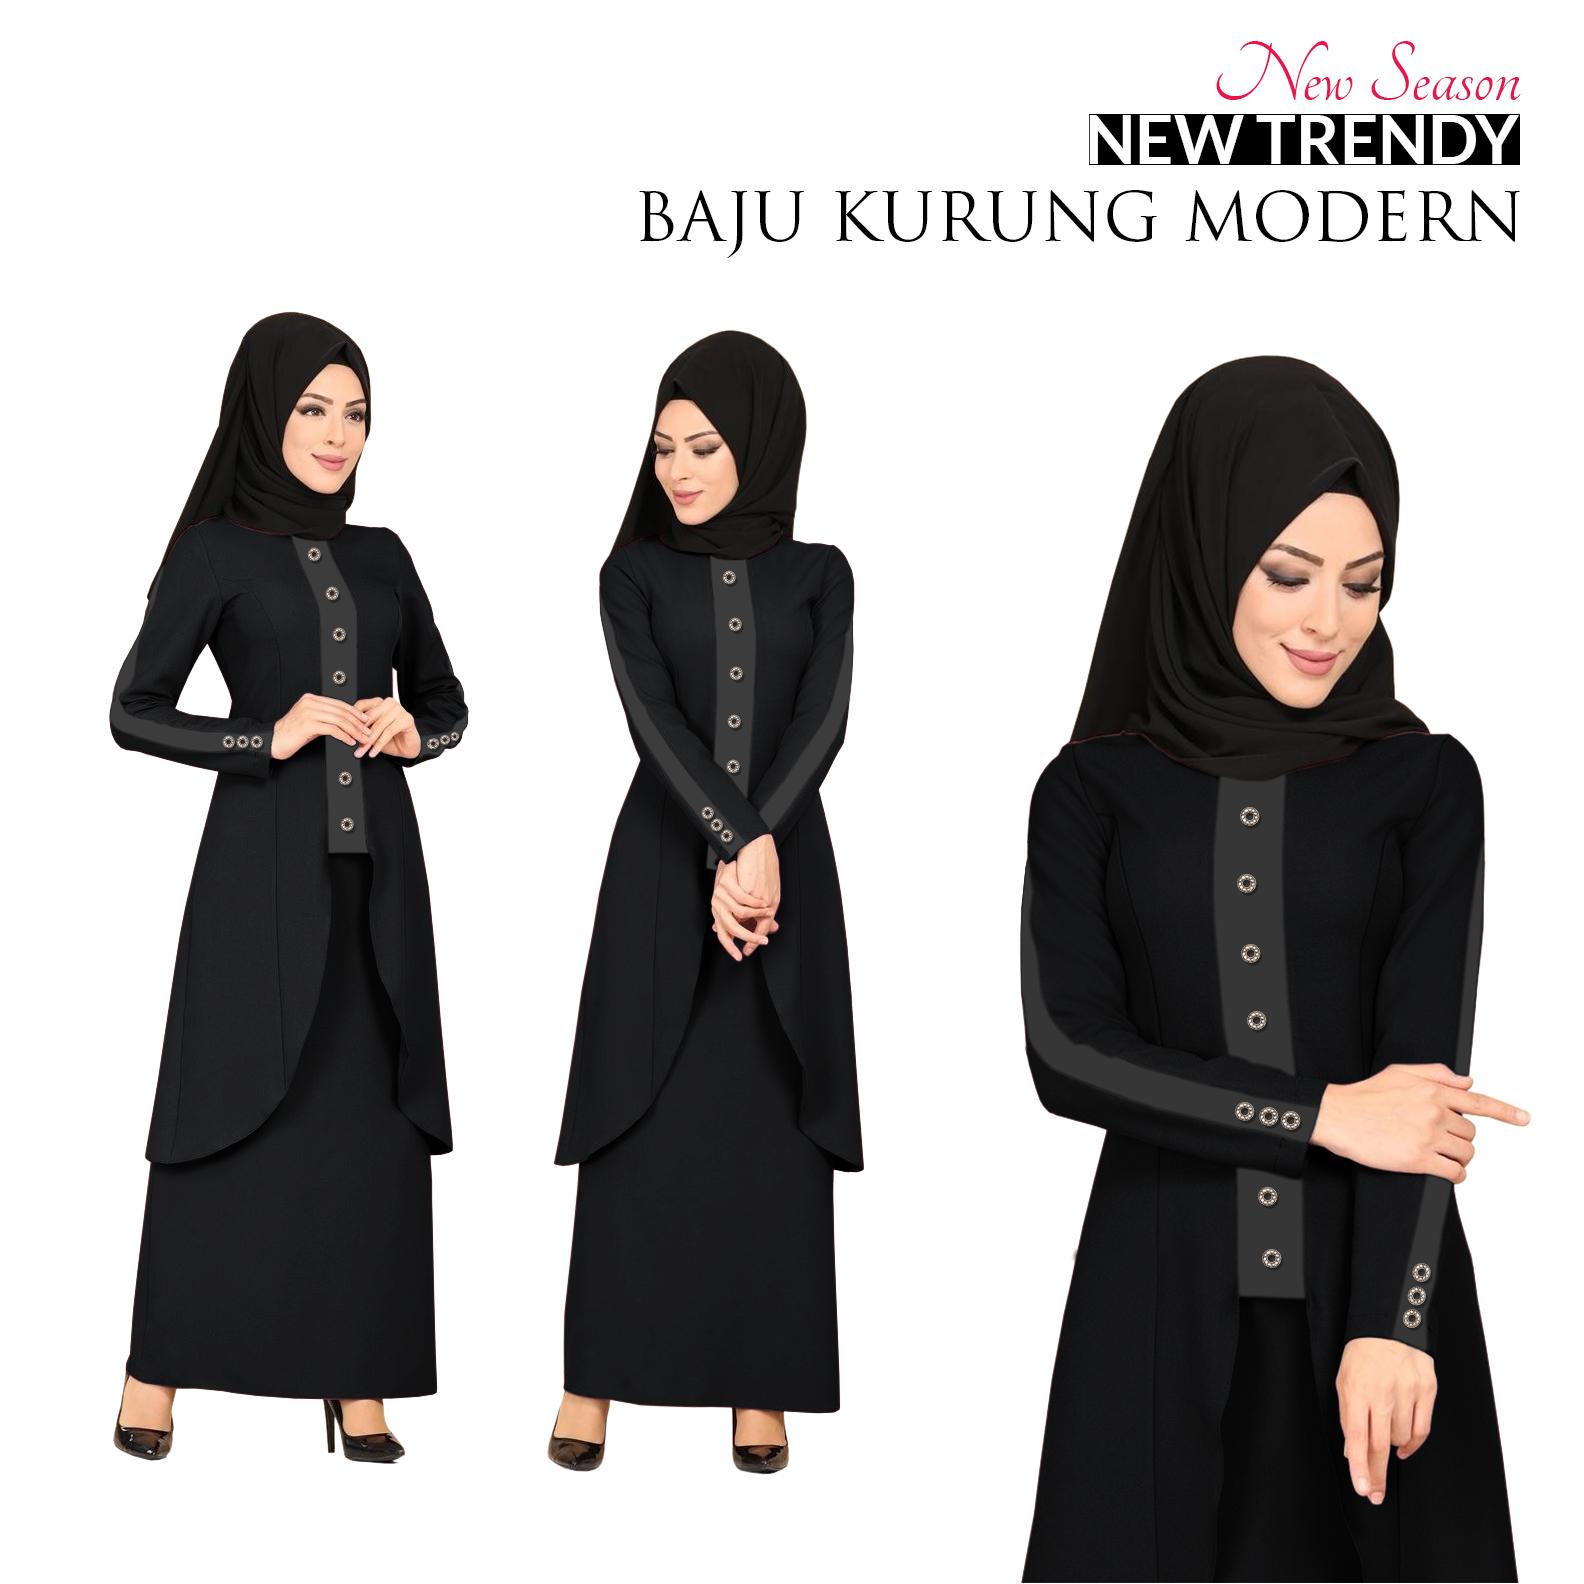 Harga New Season Trendy Baju Kurung Modern for Muslimah This Month